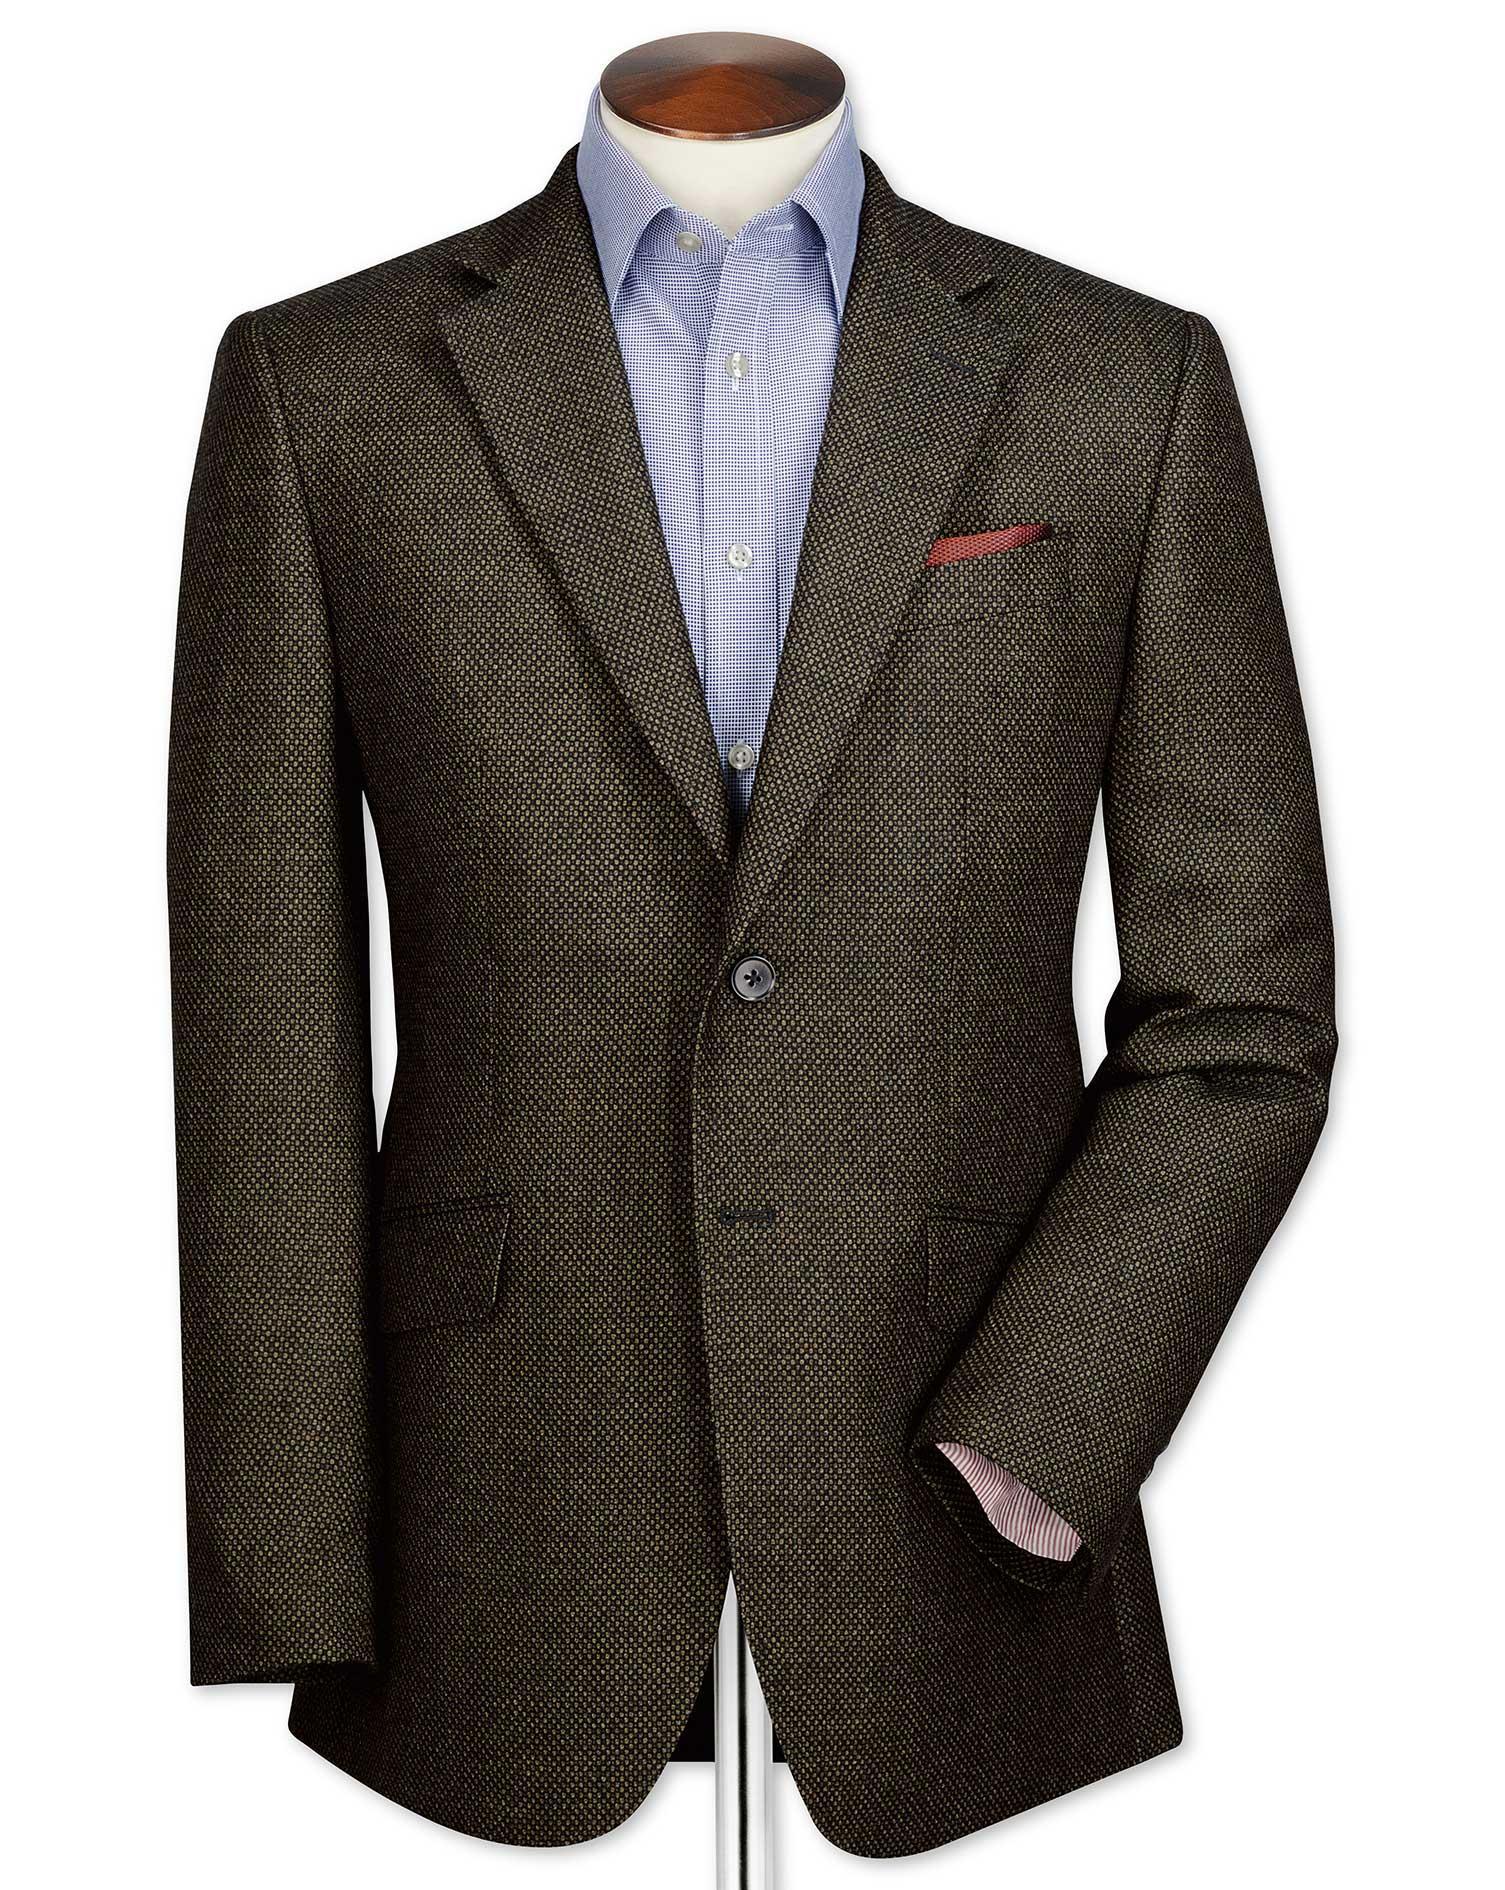 Classic Fit Olive Birdseye Lambswool Wool Jacket Size 38 Long by Charles Tyrwhitt